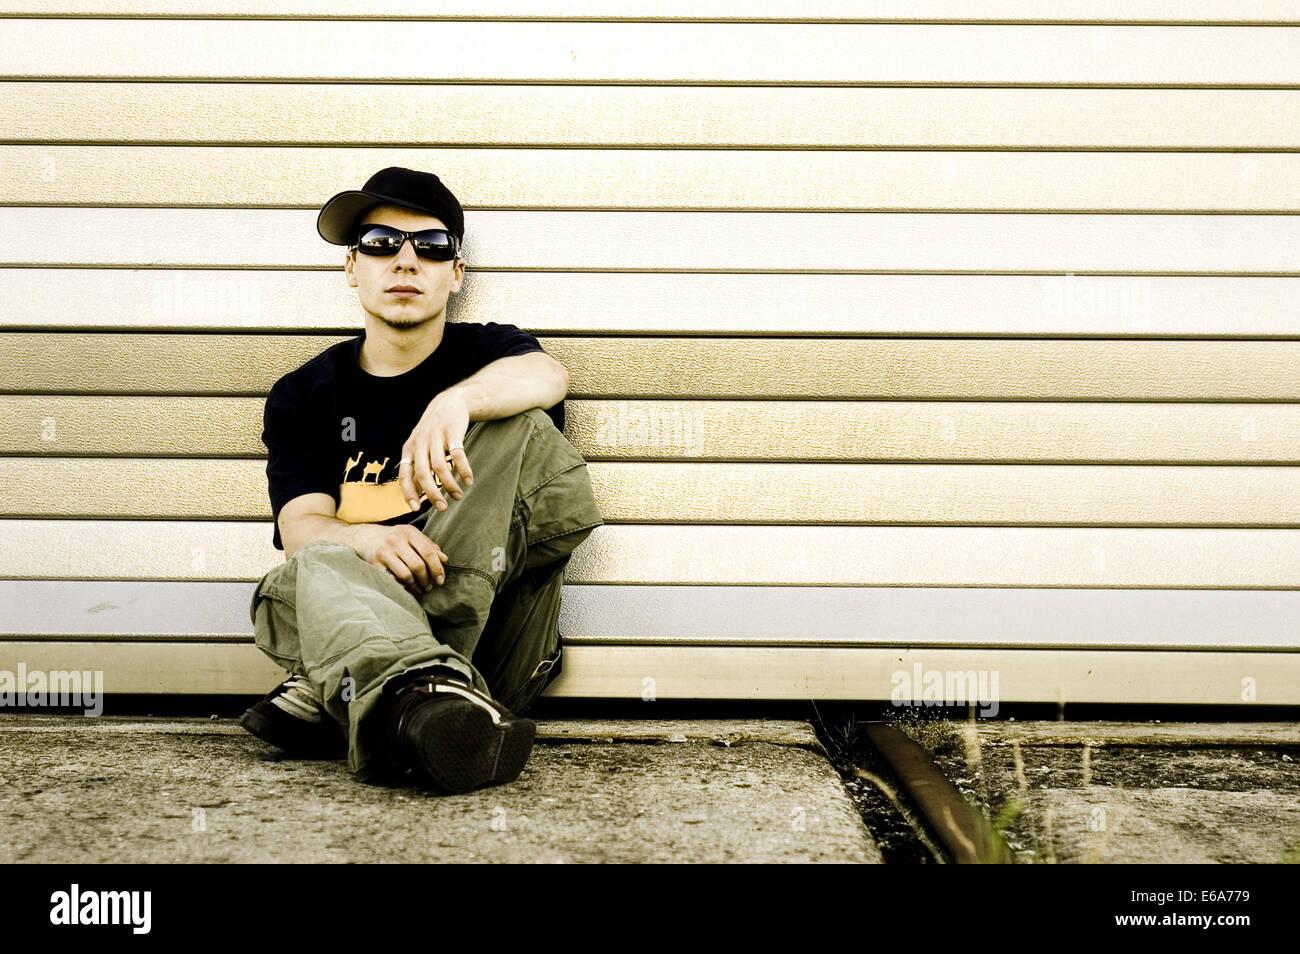 La culture des jeunes, des adolescents Photo Stock